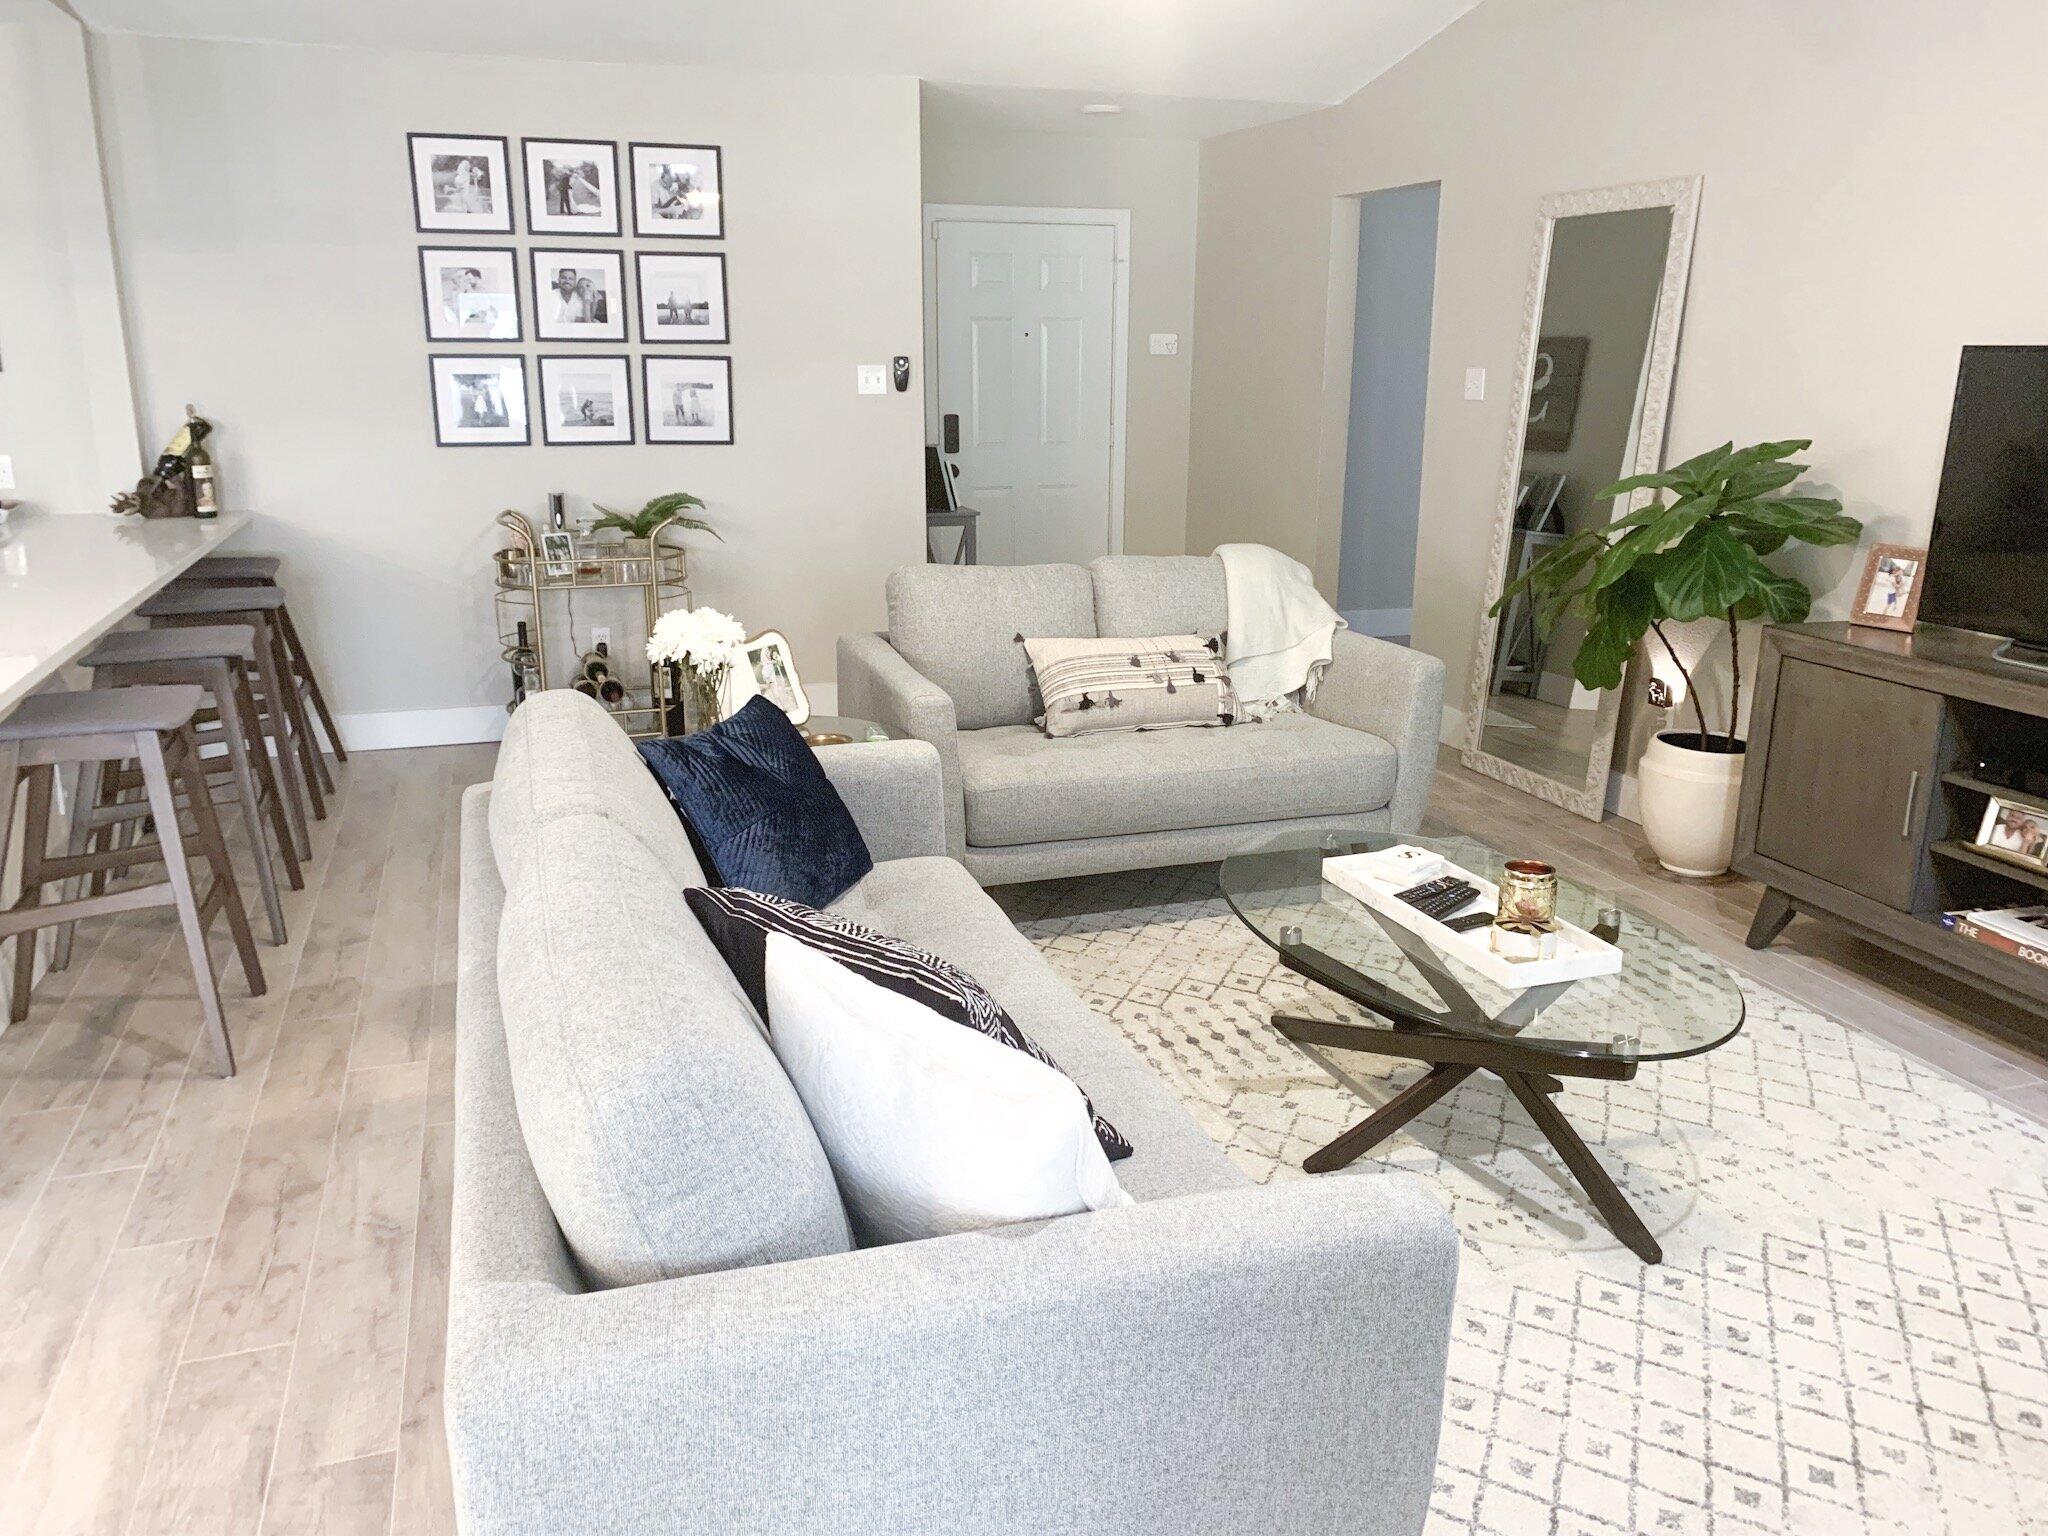 Home Decor Beauty And Lifestyle Blog Ally Samouce